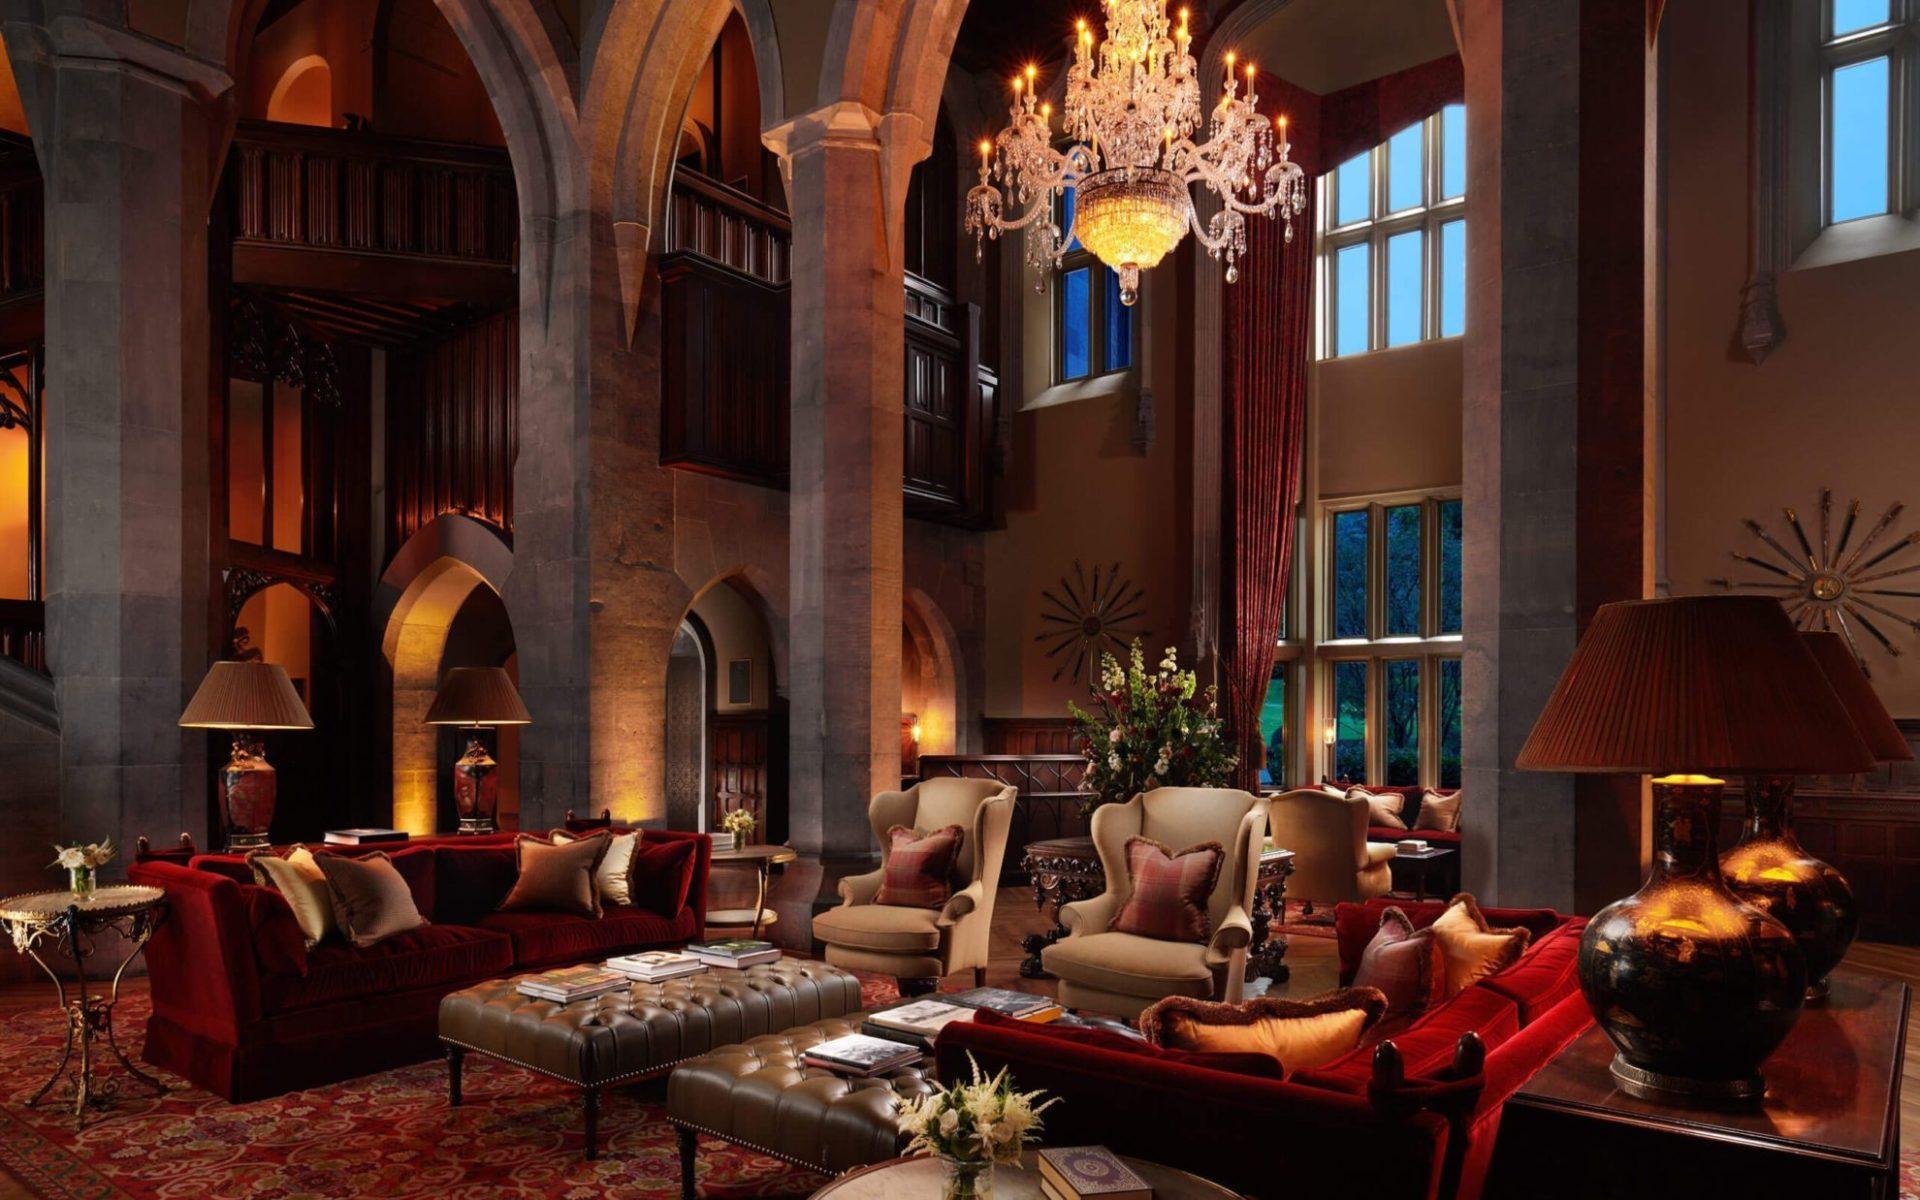 lobby-adare-manor-1-1920x1200.jpg